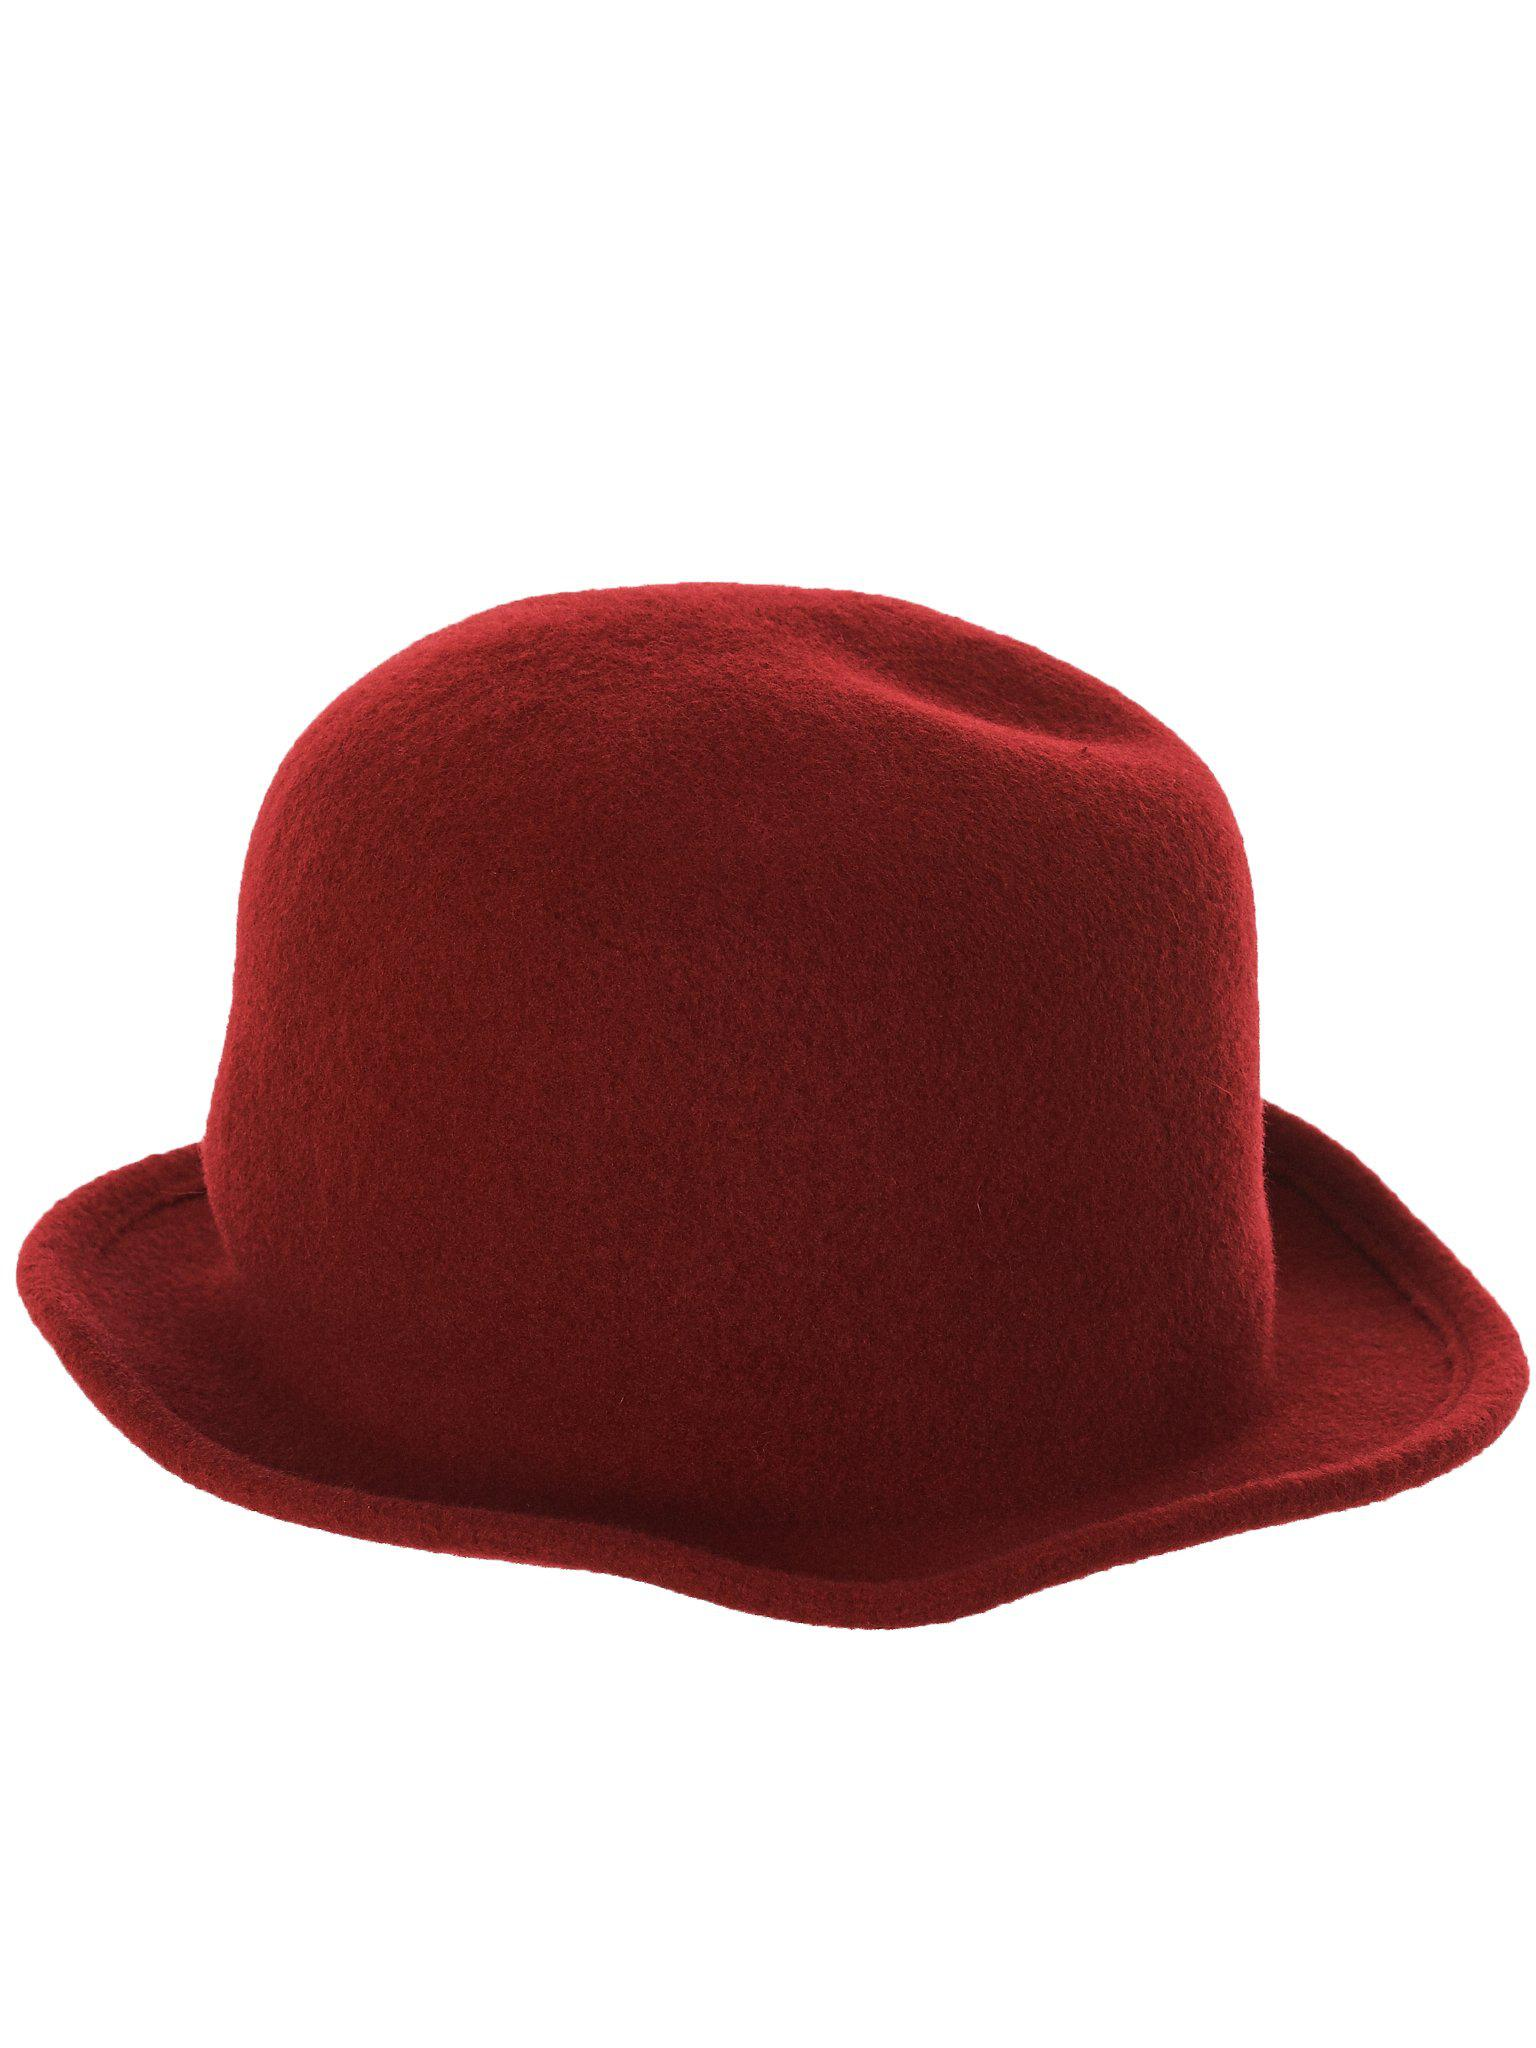 ACCESSORIES - Hats SCHA aRmpmU